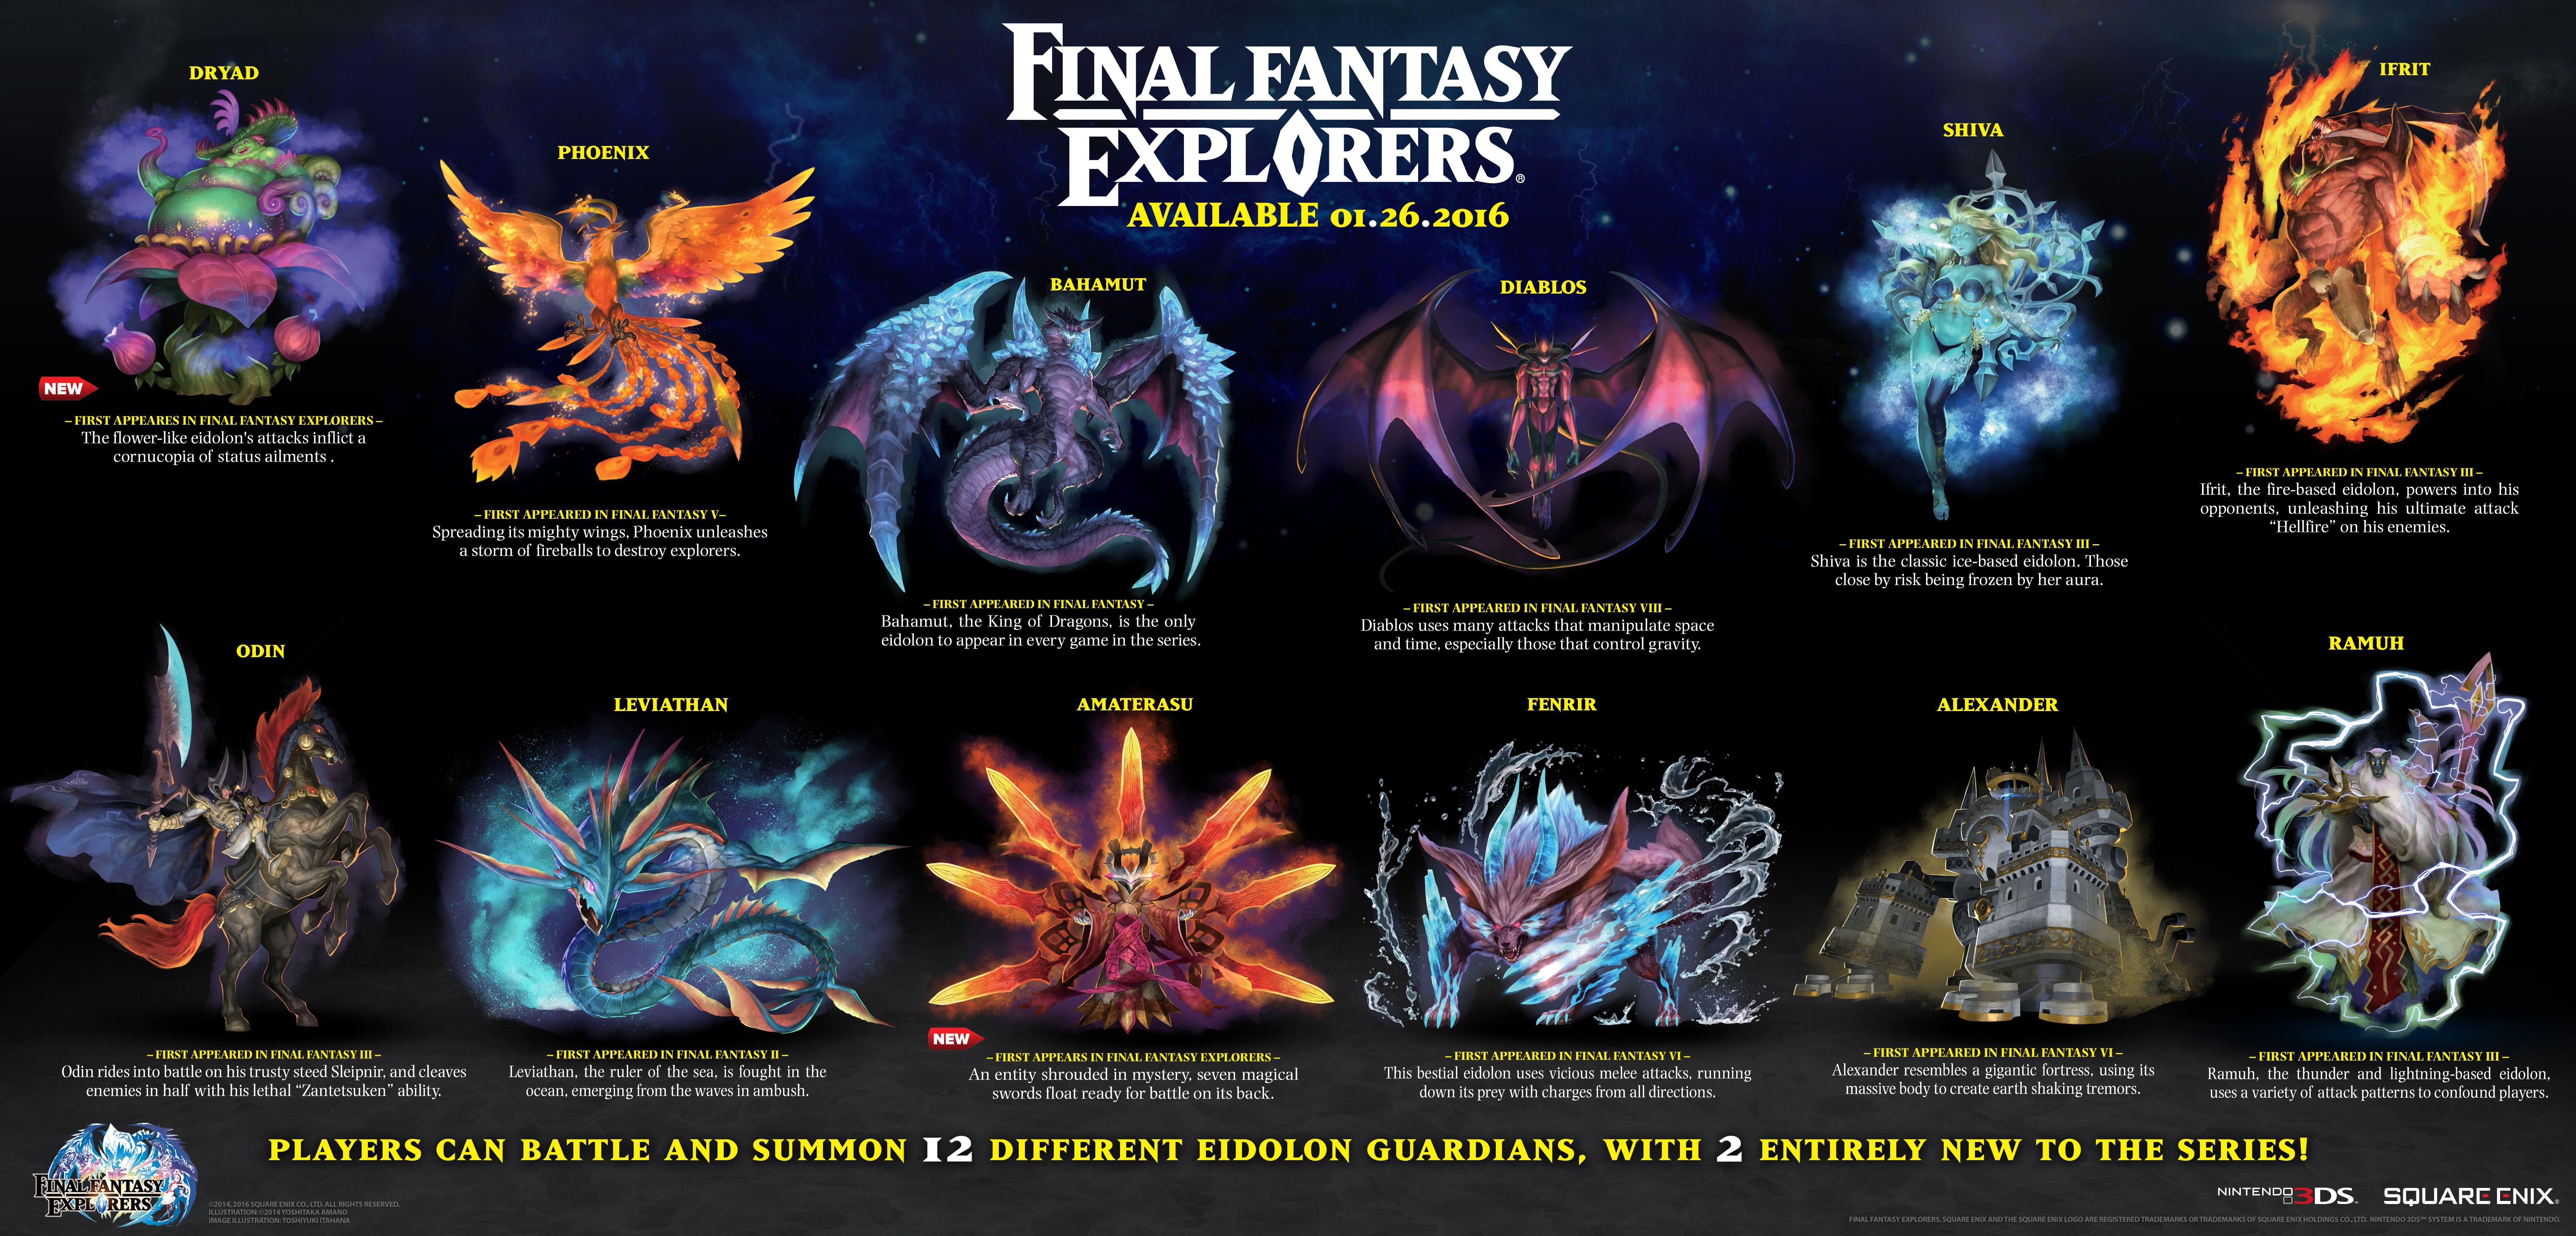 Final fantasy summons